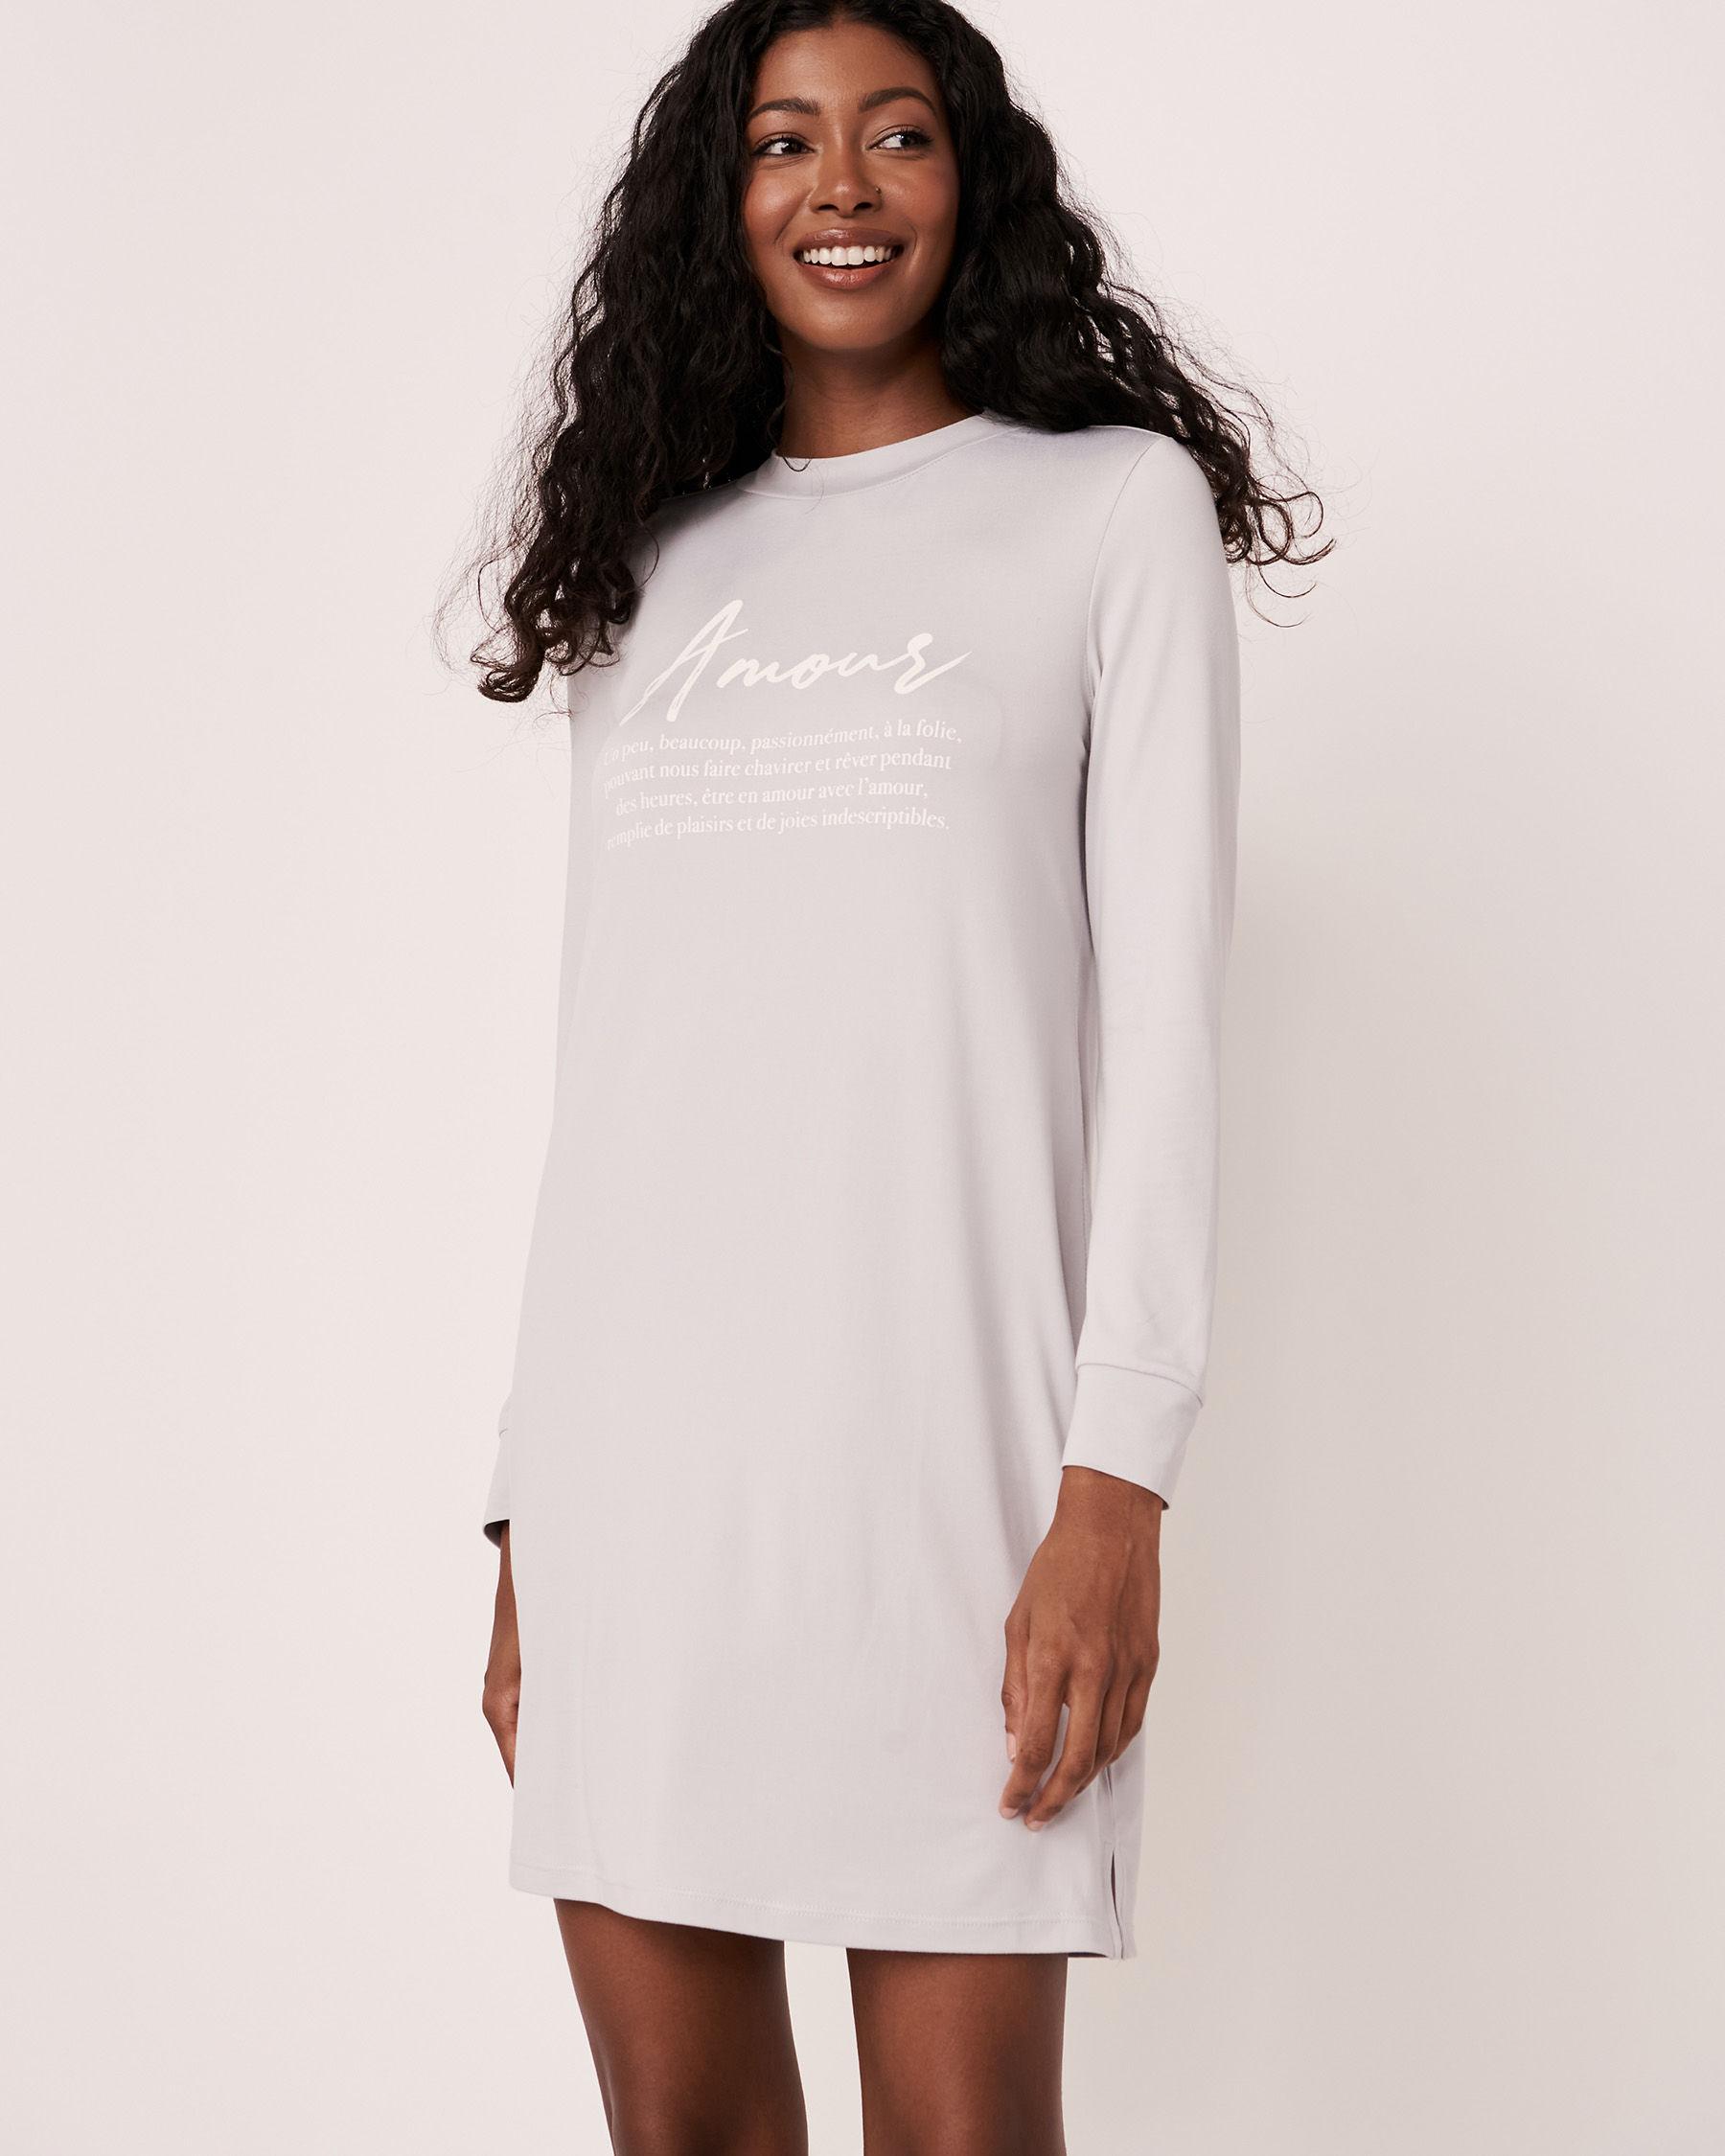 LA VIE EN ROSE High Neck Long Sleeve Sleepshirt Grey print 40500076 - View2